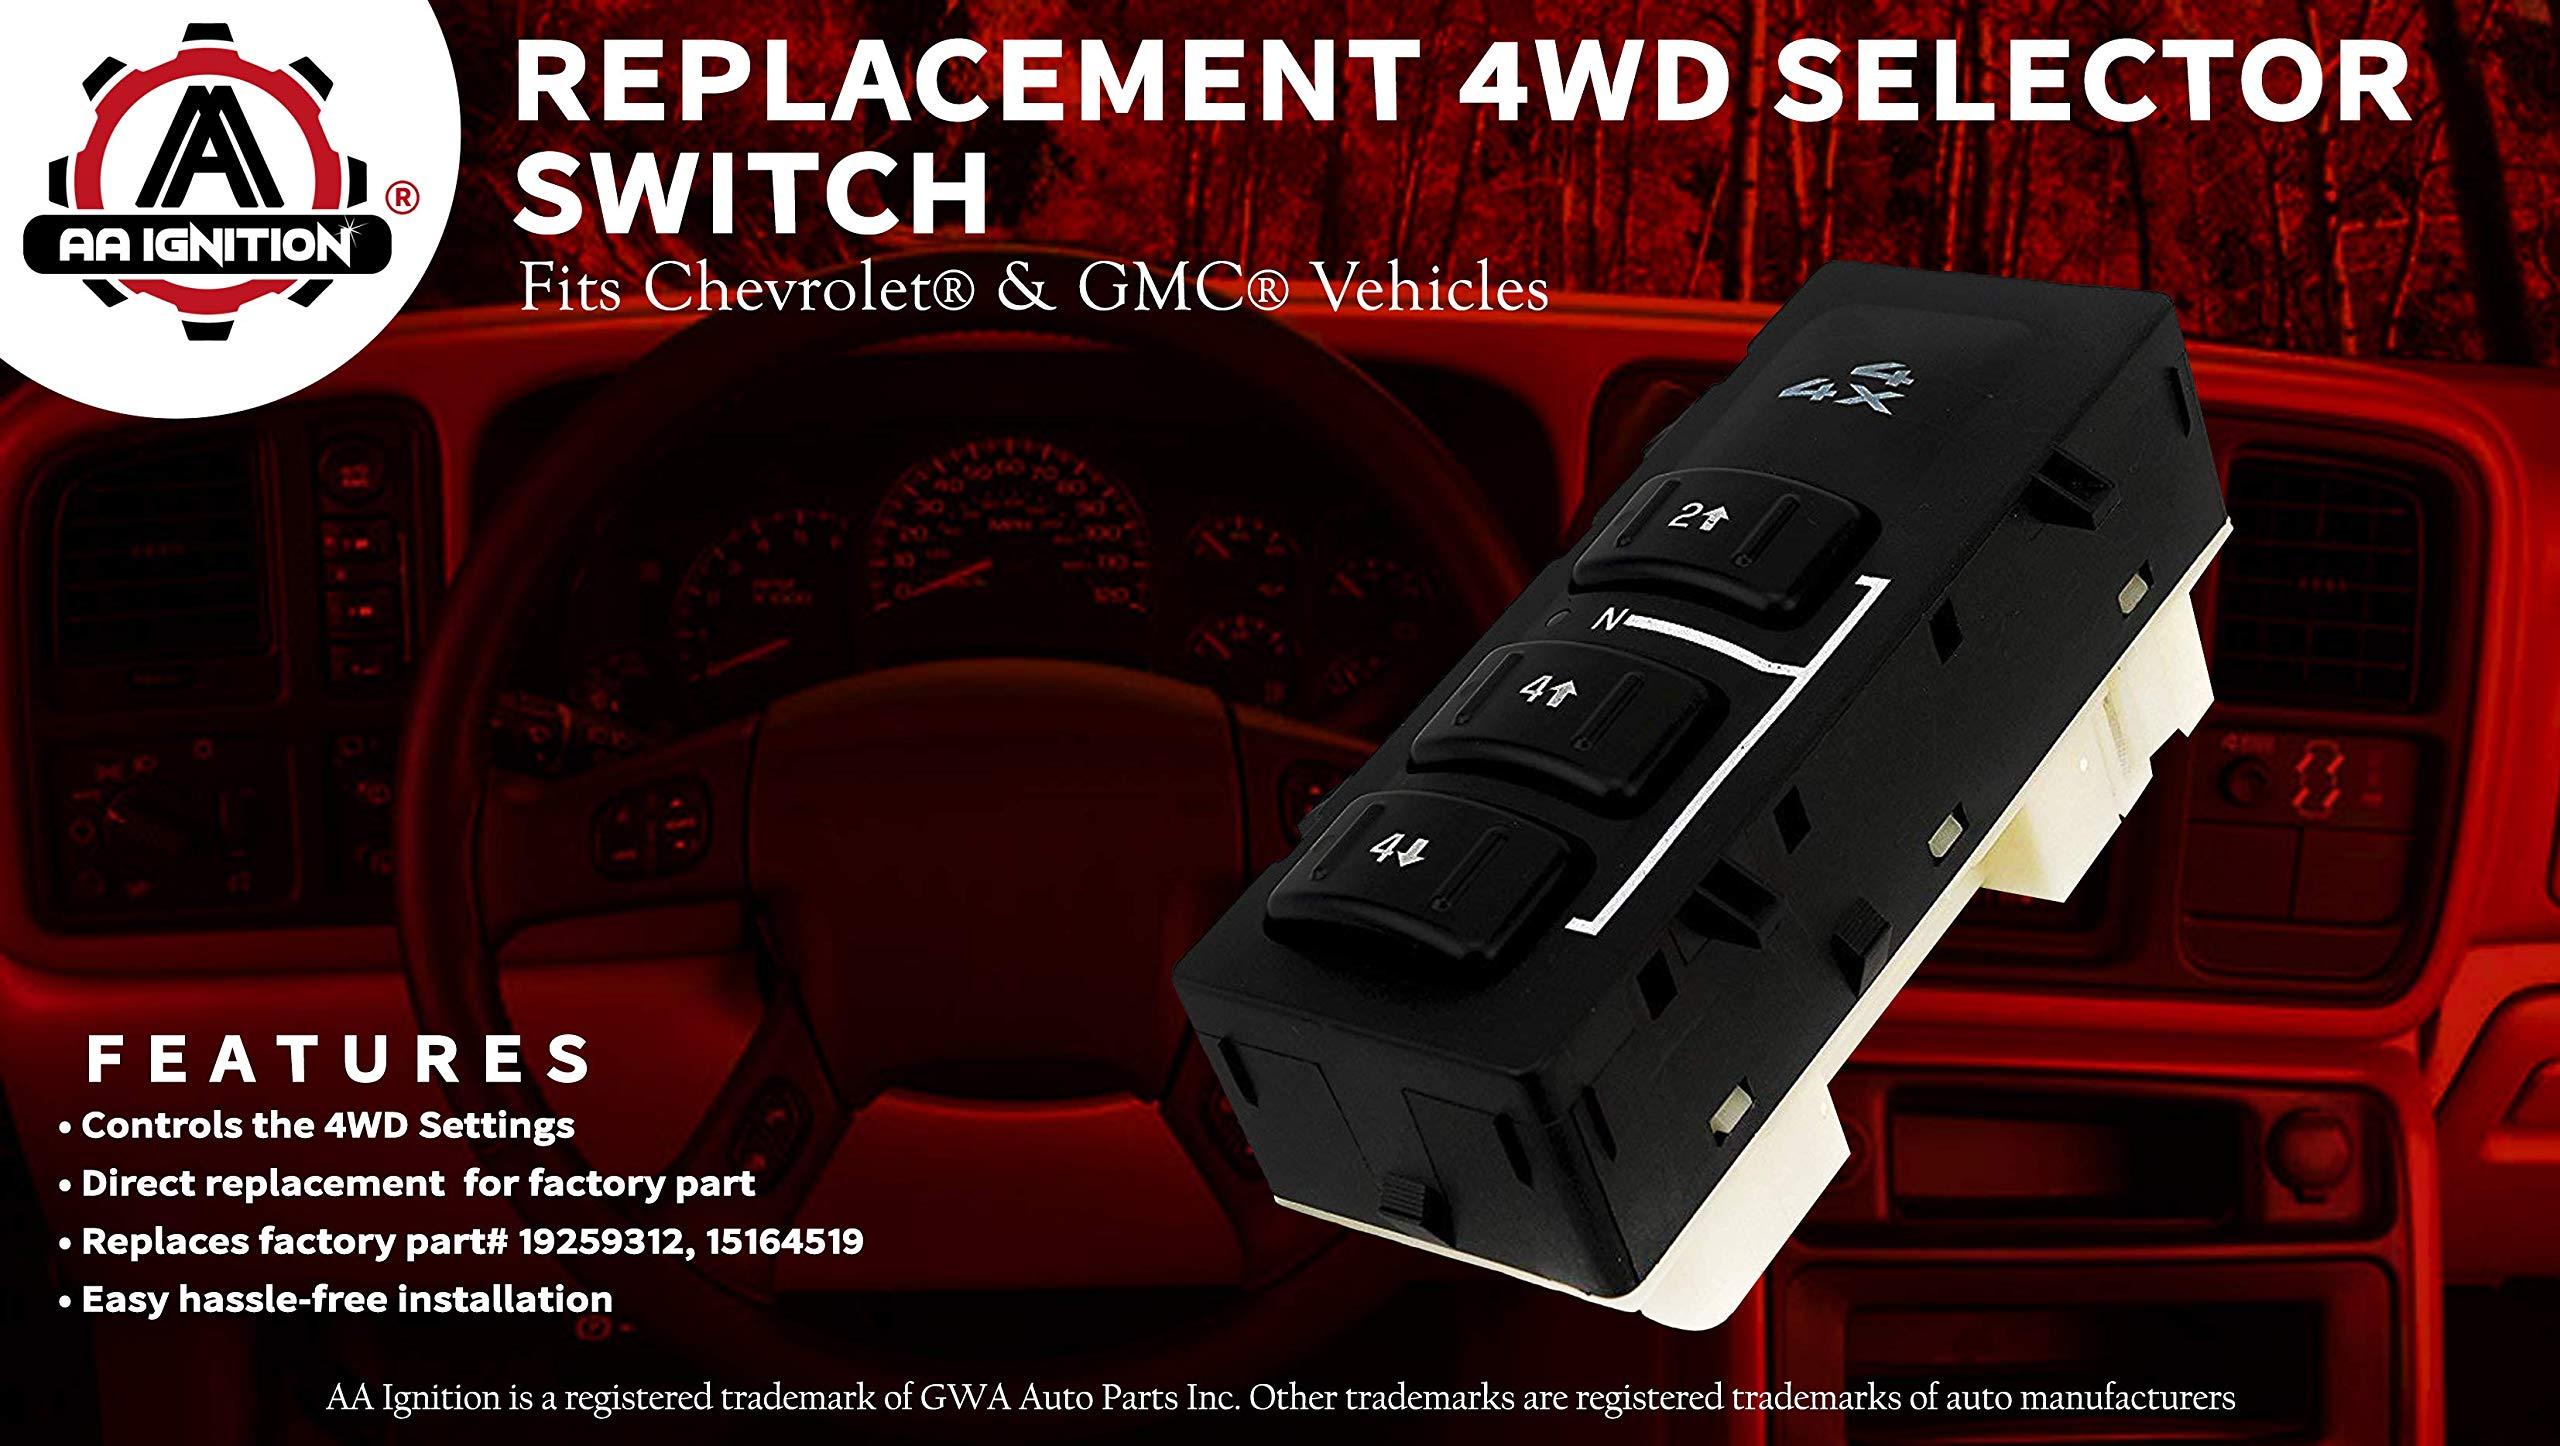 4wd Selector Switch 4x4 Fits Chevy Silverado Suburban Avalanche 2003 Gmc Transfer Case Identification Yukon Xl Sierra 2007 Replaces 19259312 15164519 15136040 4 Wheel Drive For Chevrolet Four